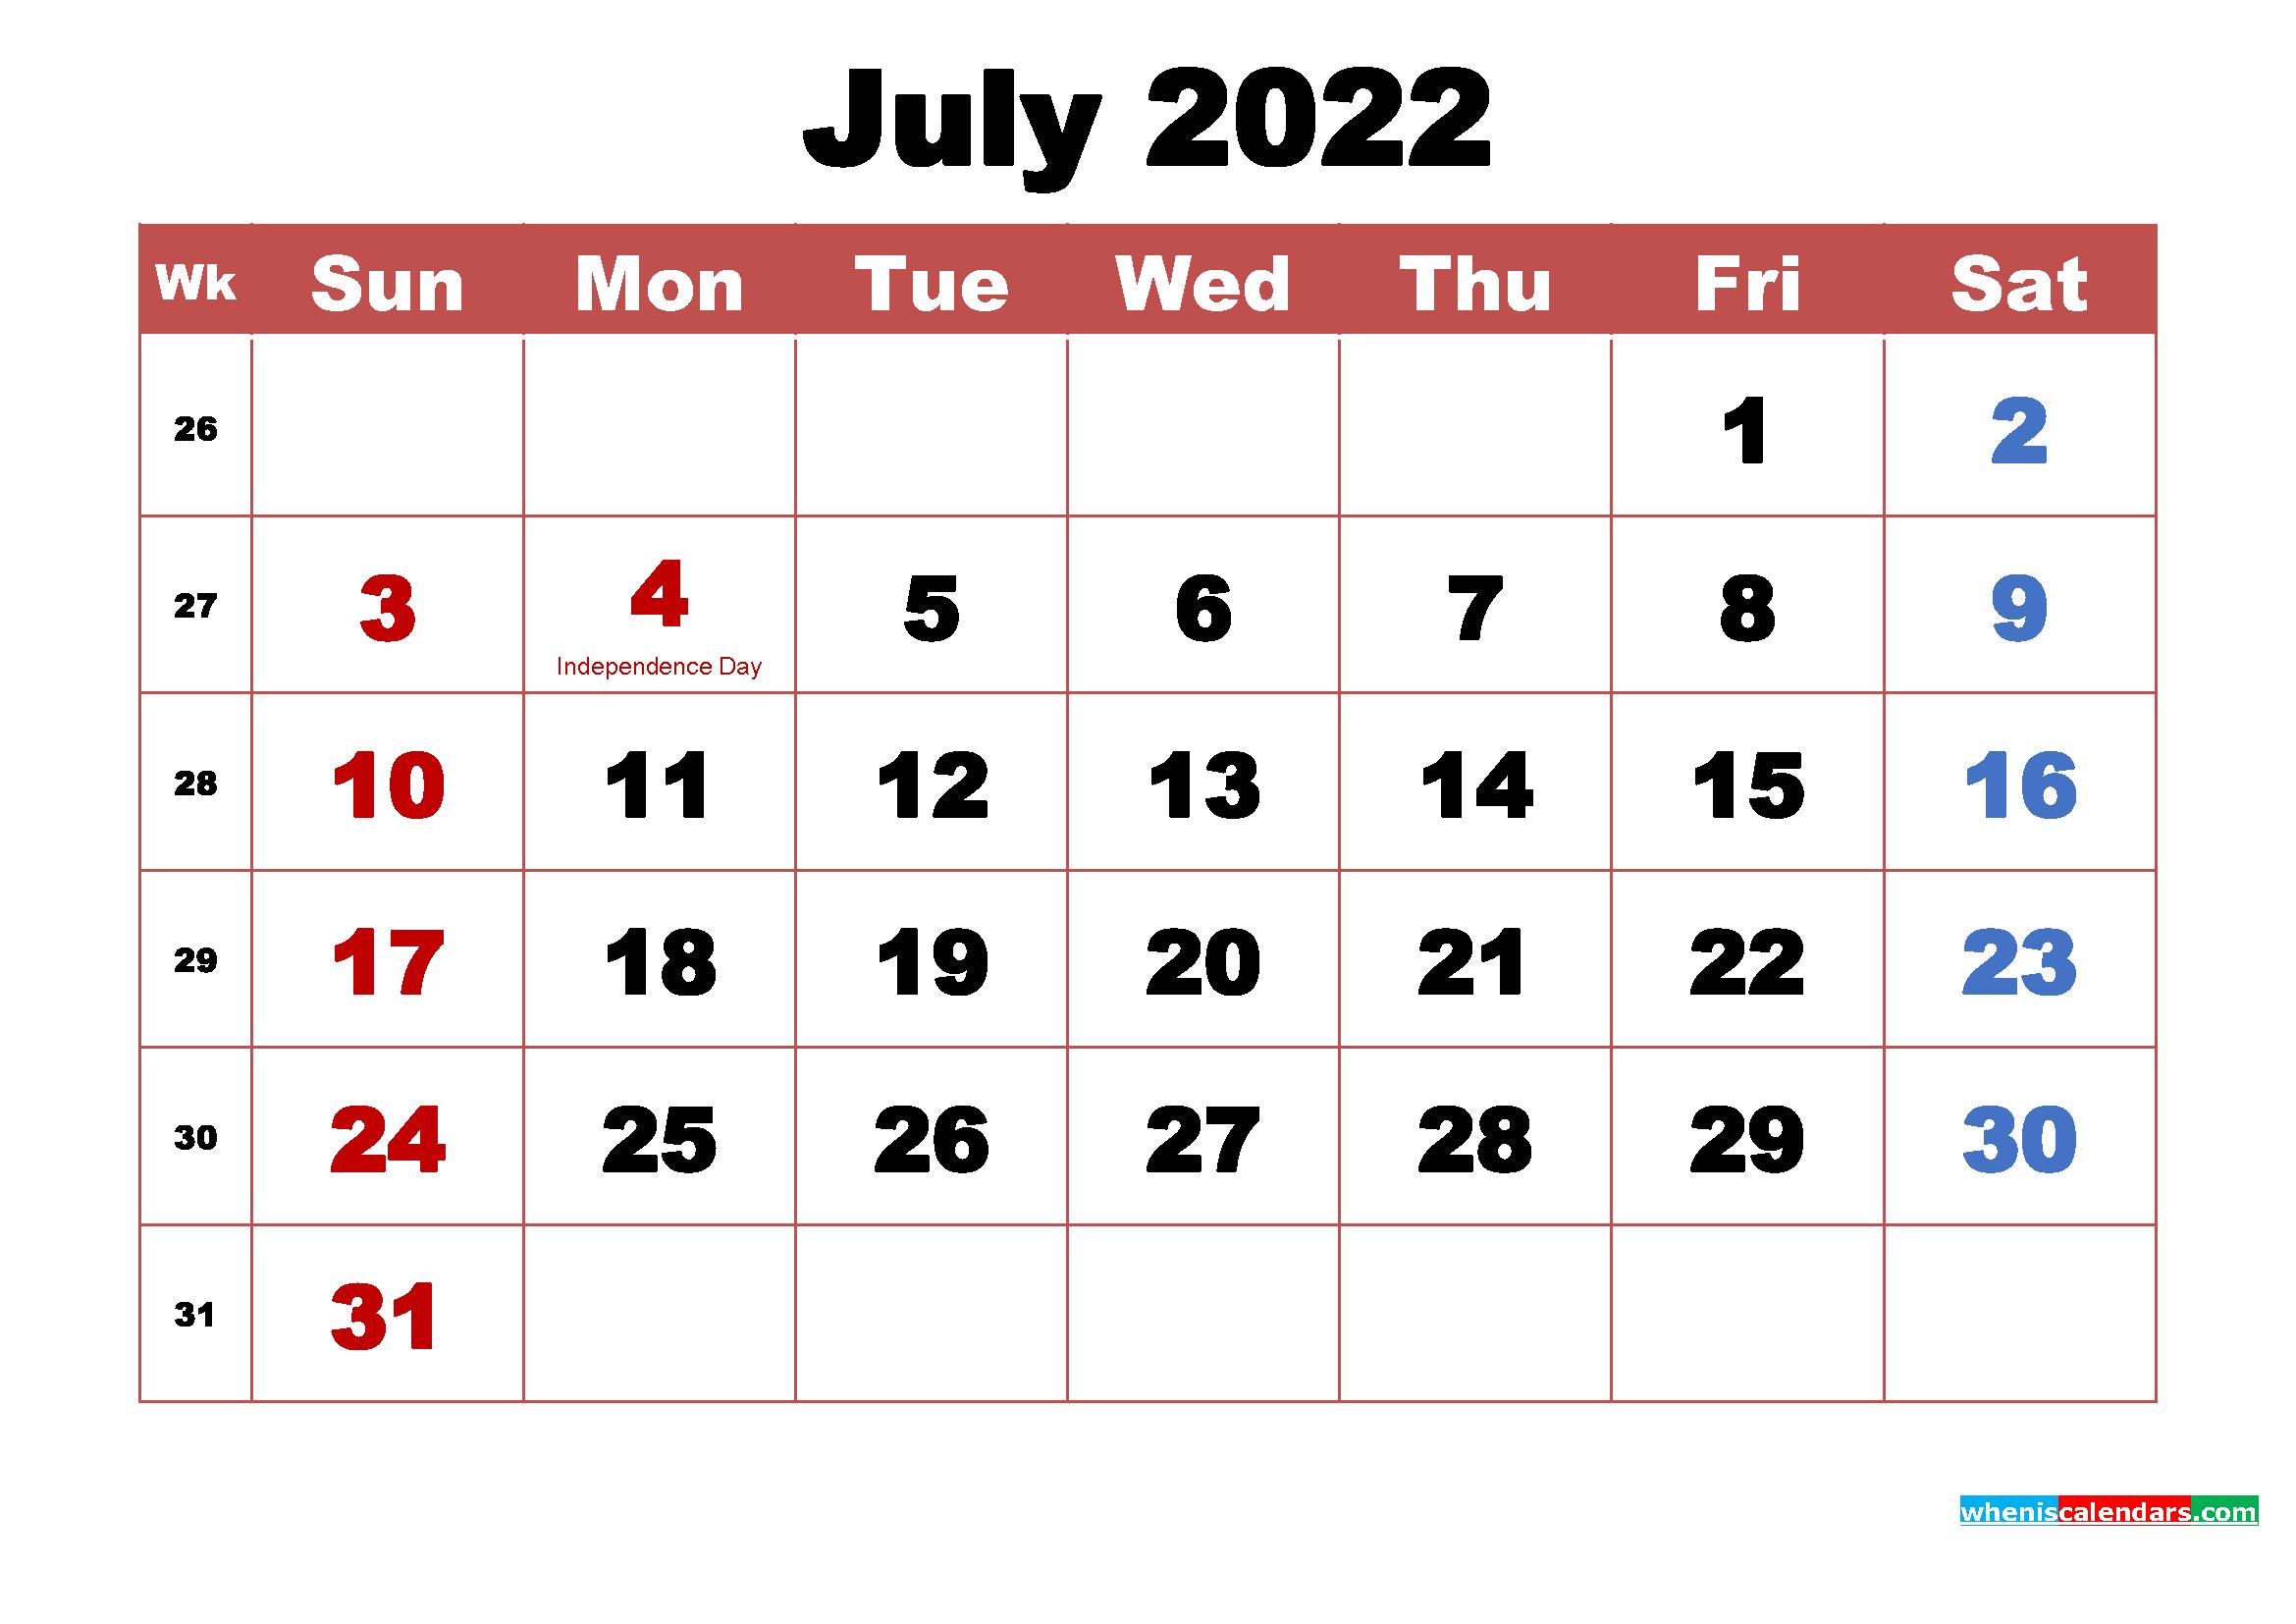 July 2022 Calendar Template.July 2022 Calendar With Holidays Printable Free Printable 2021 Monthly Calendar With Holidays